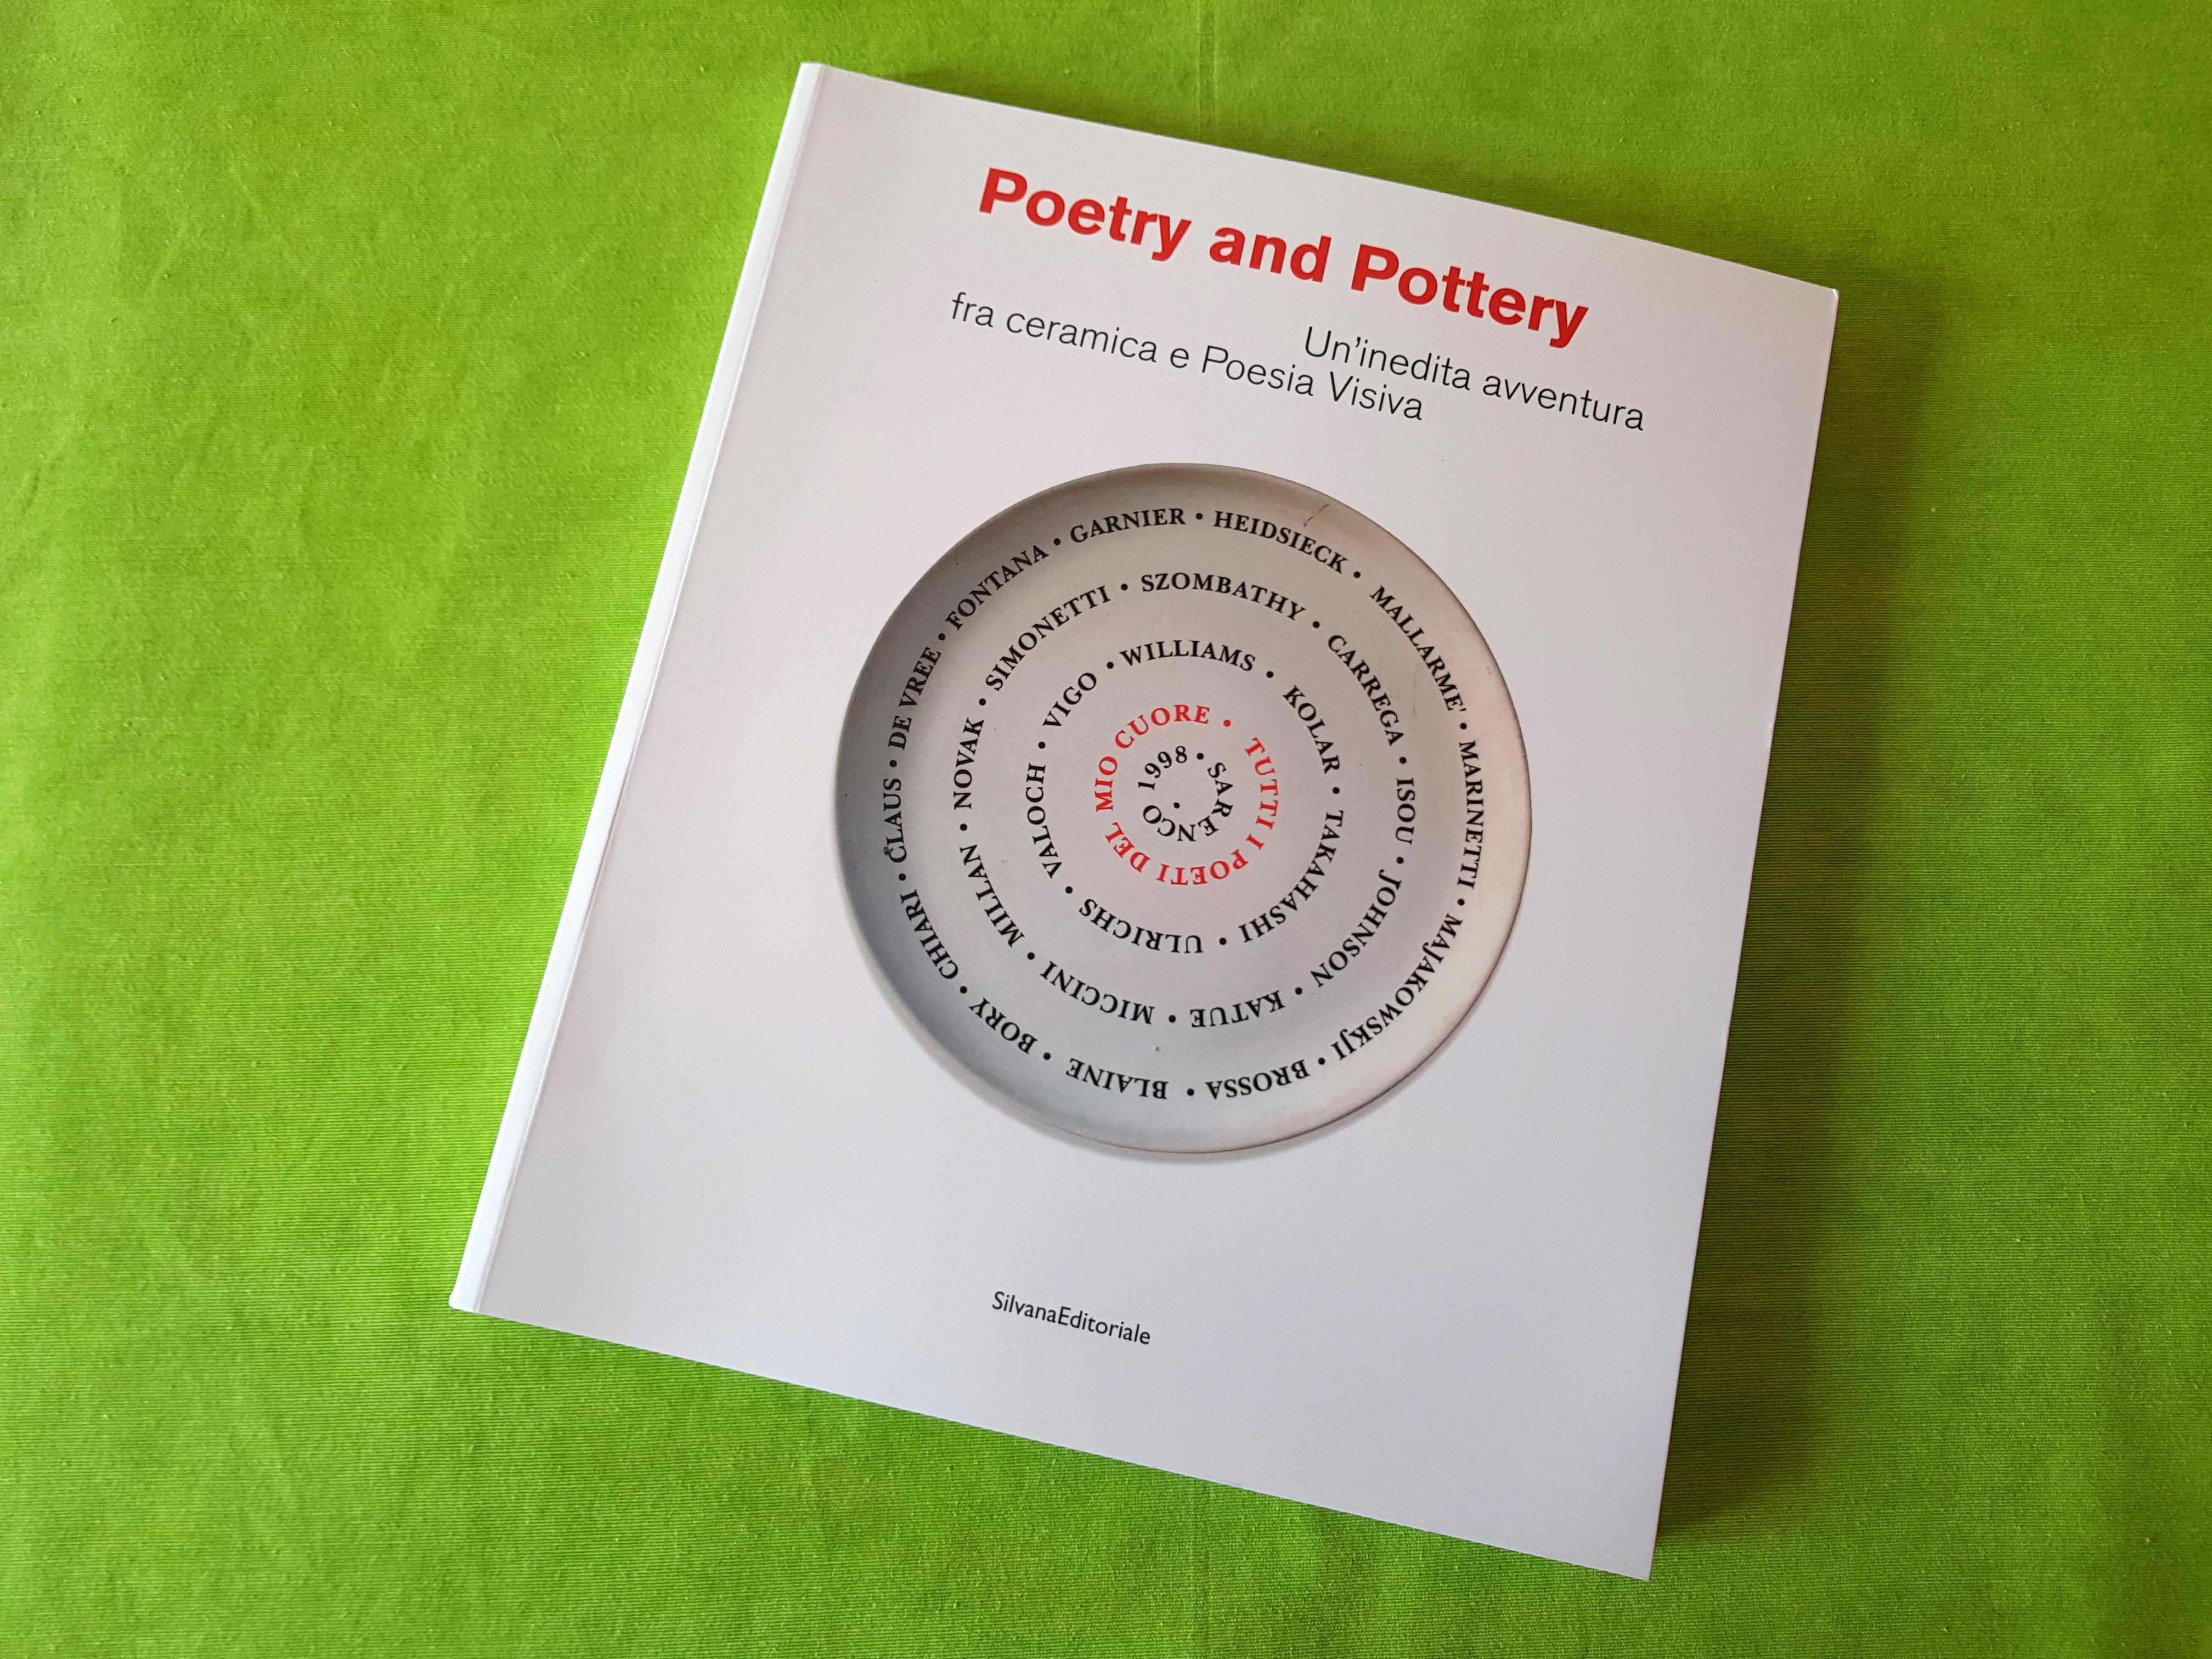 bfa8e8bcc8 giovanni fontana - poetry and pottery ESCAPE='HTML'